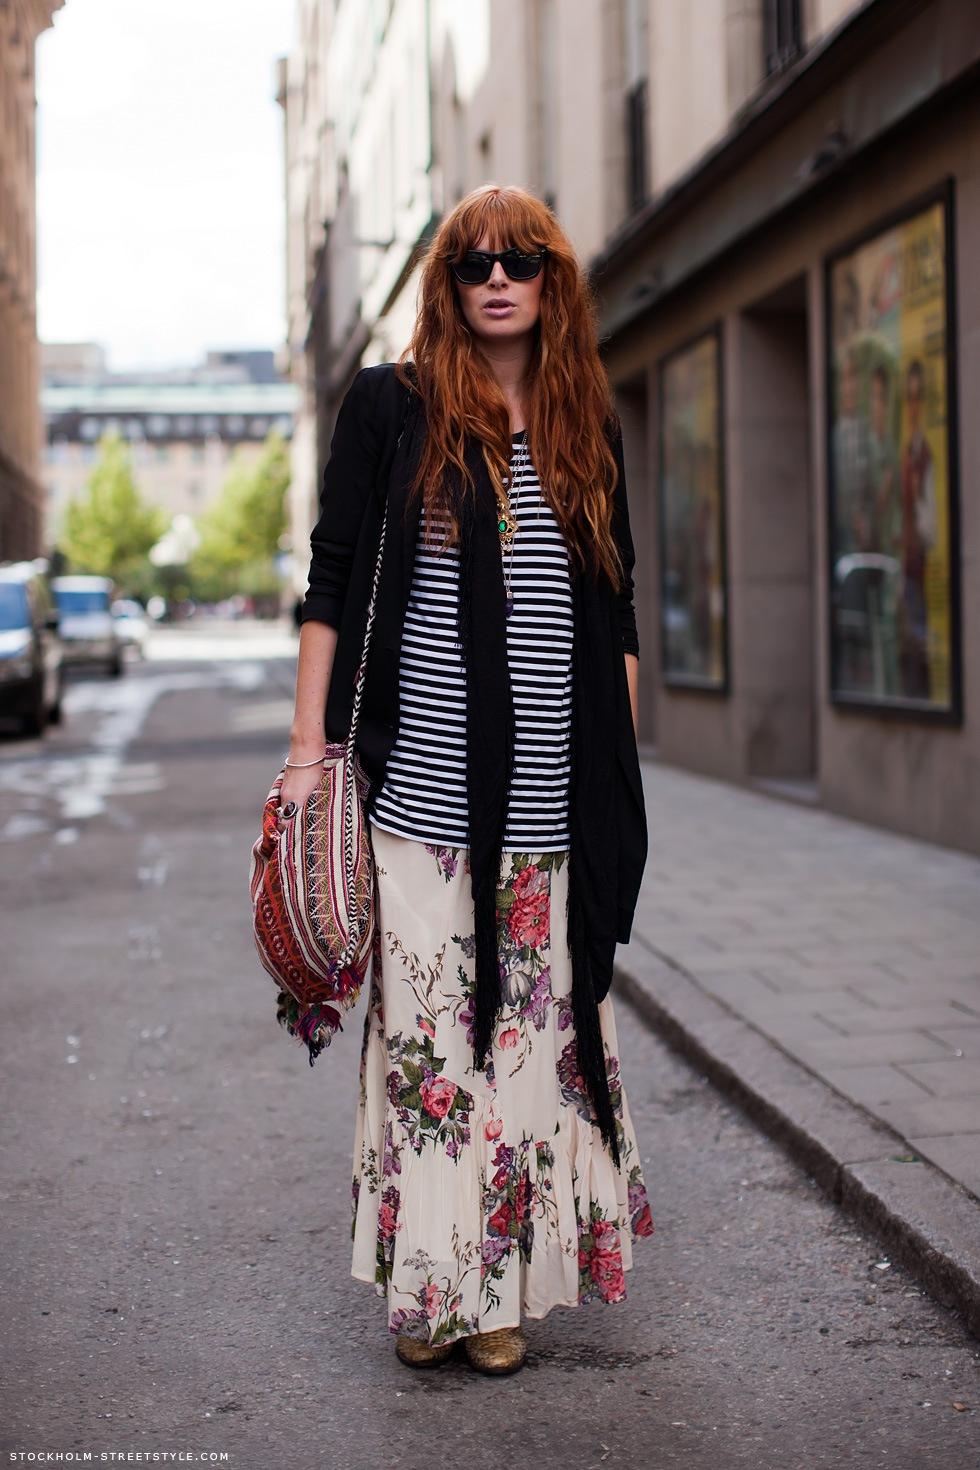 maxi-floral-skirt-striped-tshirt